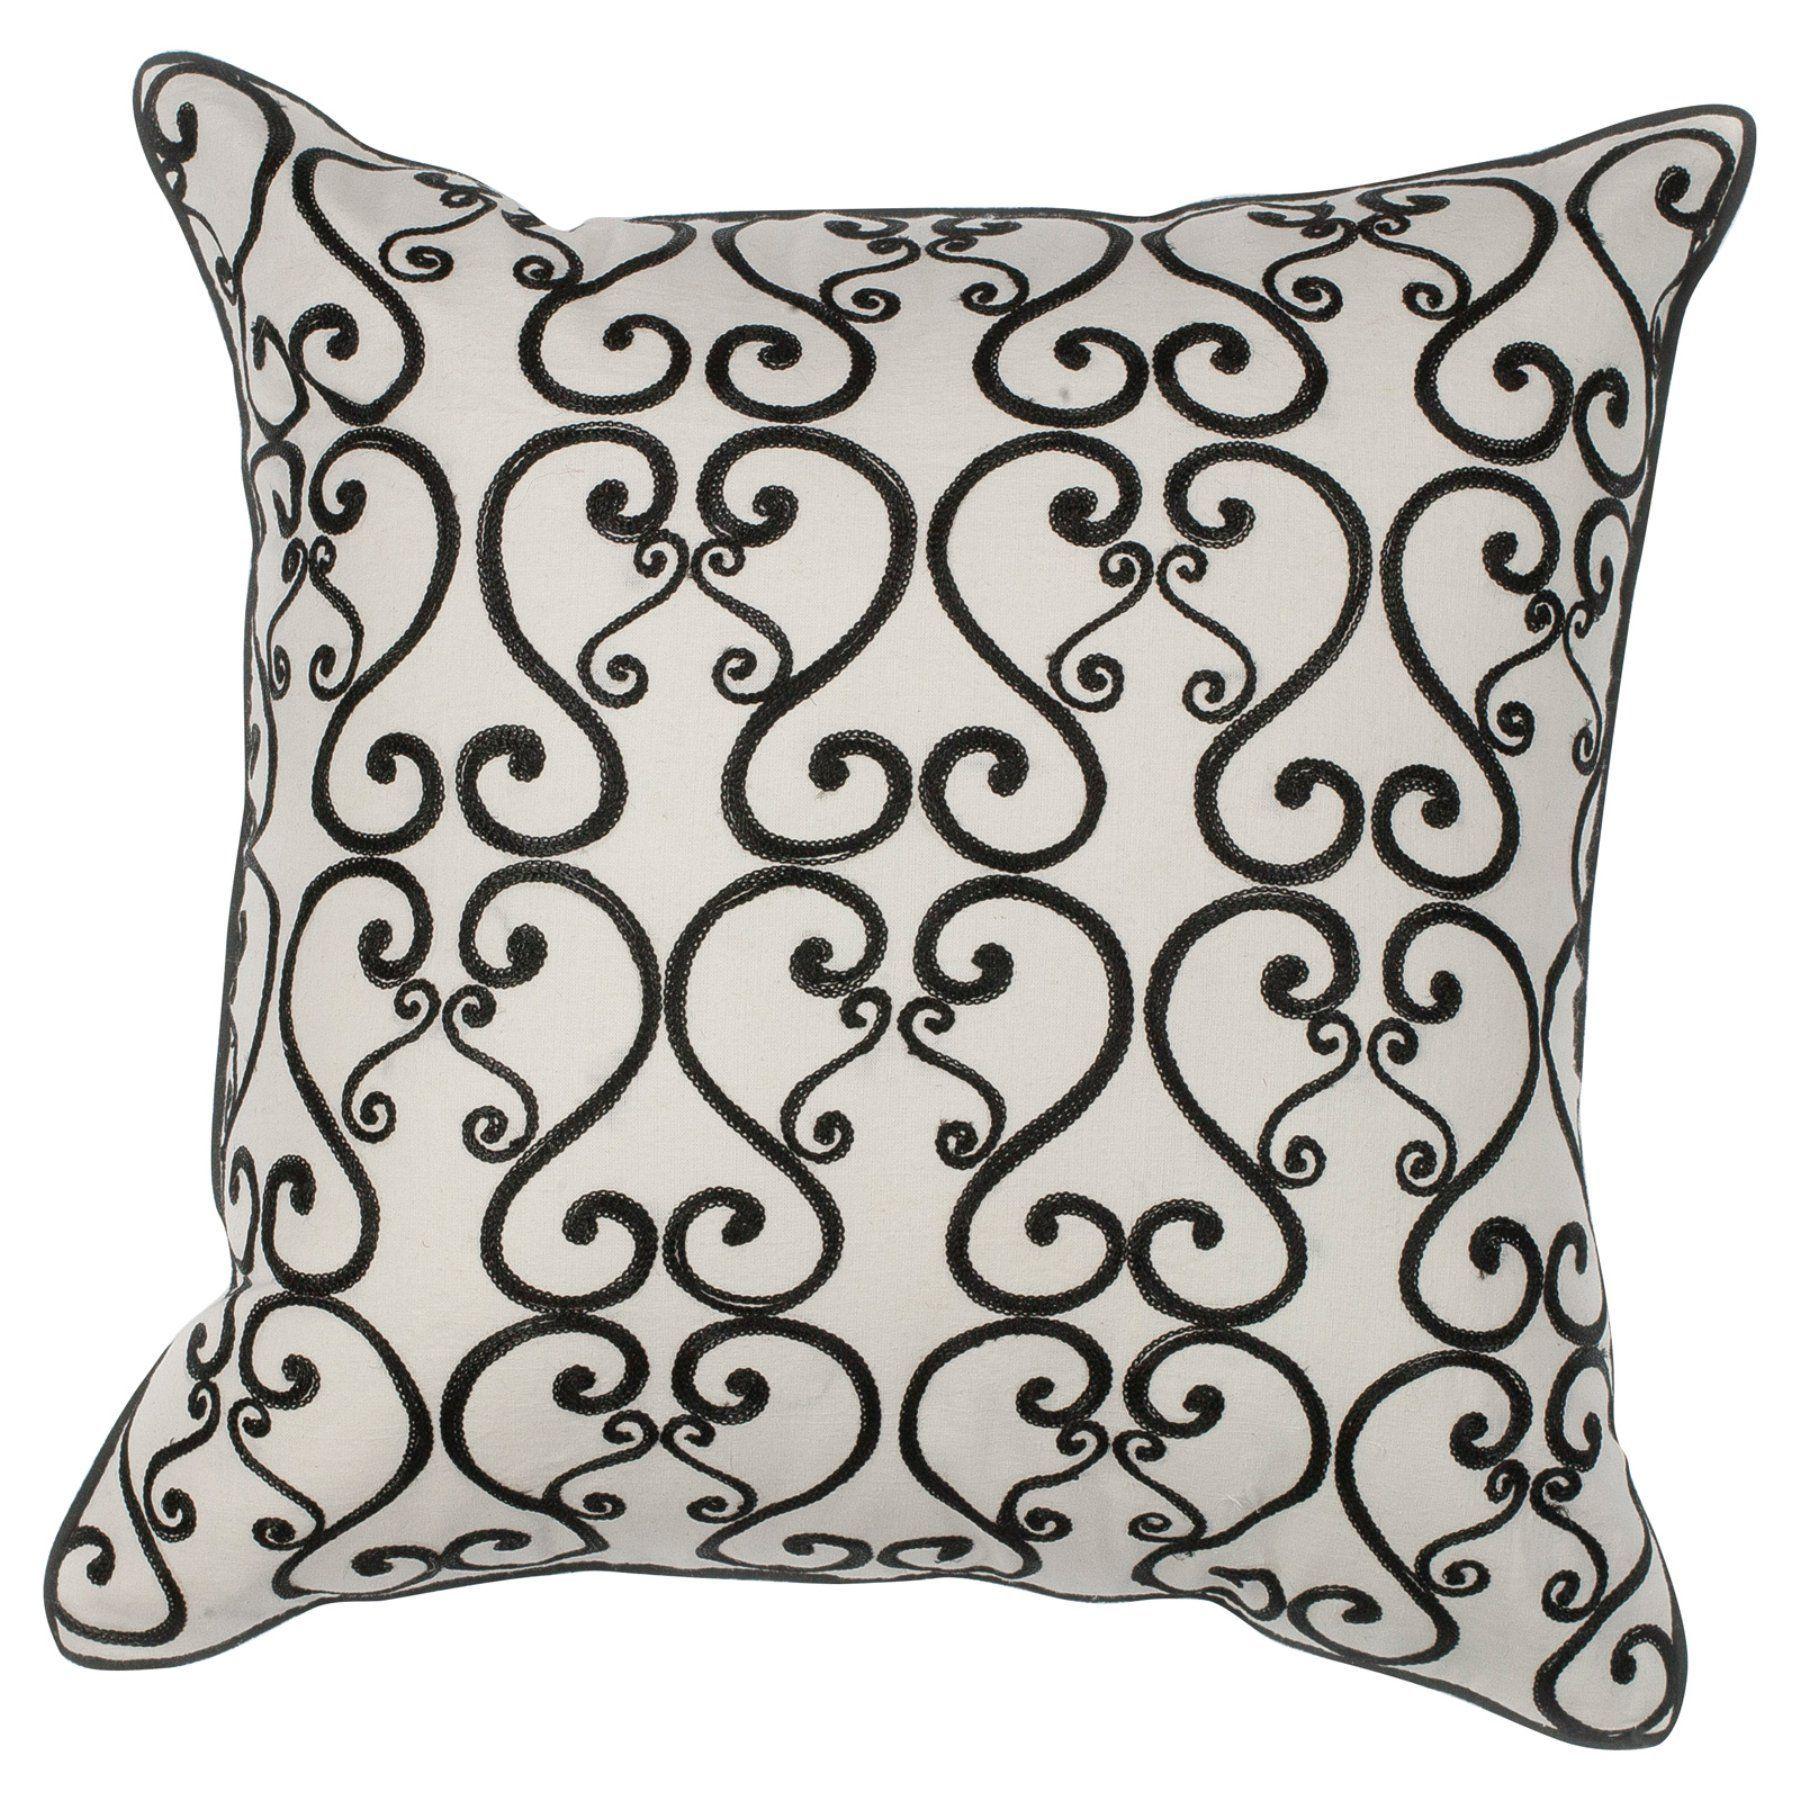 Kas Rugs Luminous Decorative Pillow Pill12018sq Blue Pillows Decorative Black Decorative Pillows Decorative Pillows